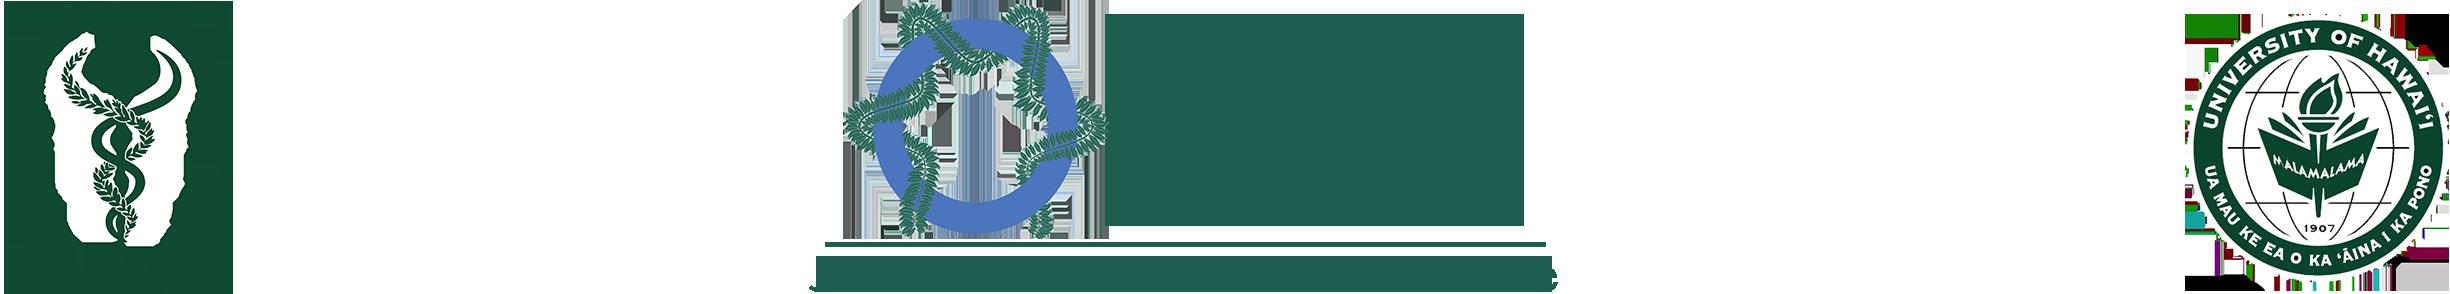 Diabetes Research Center